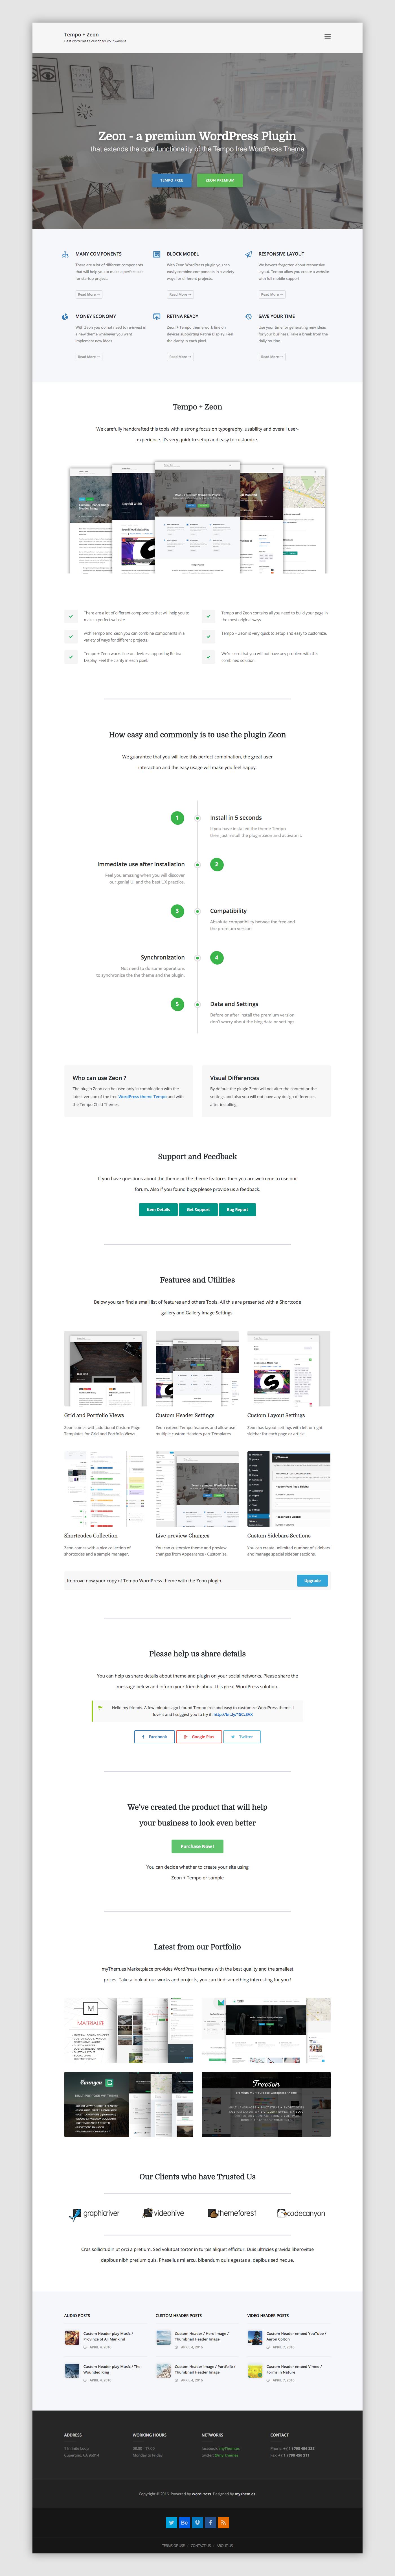 Tempo free WordPress Theme + Zeon WordPress Plugin